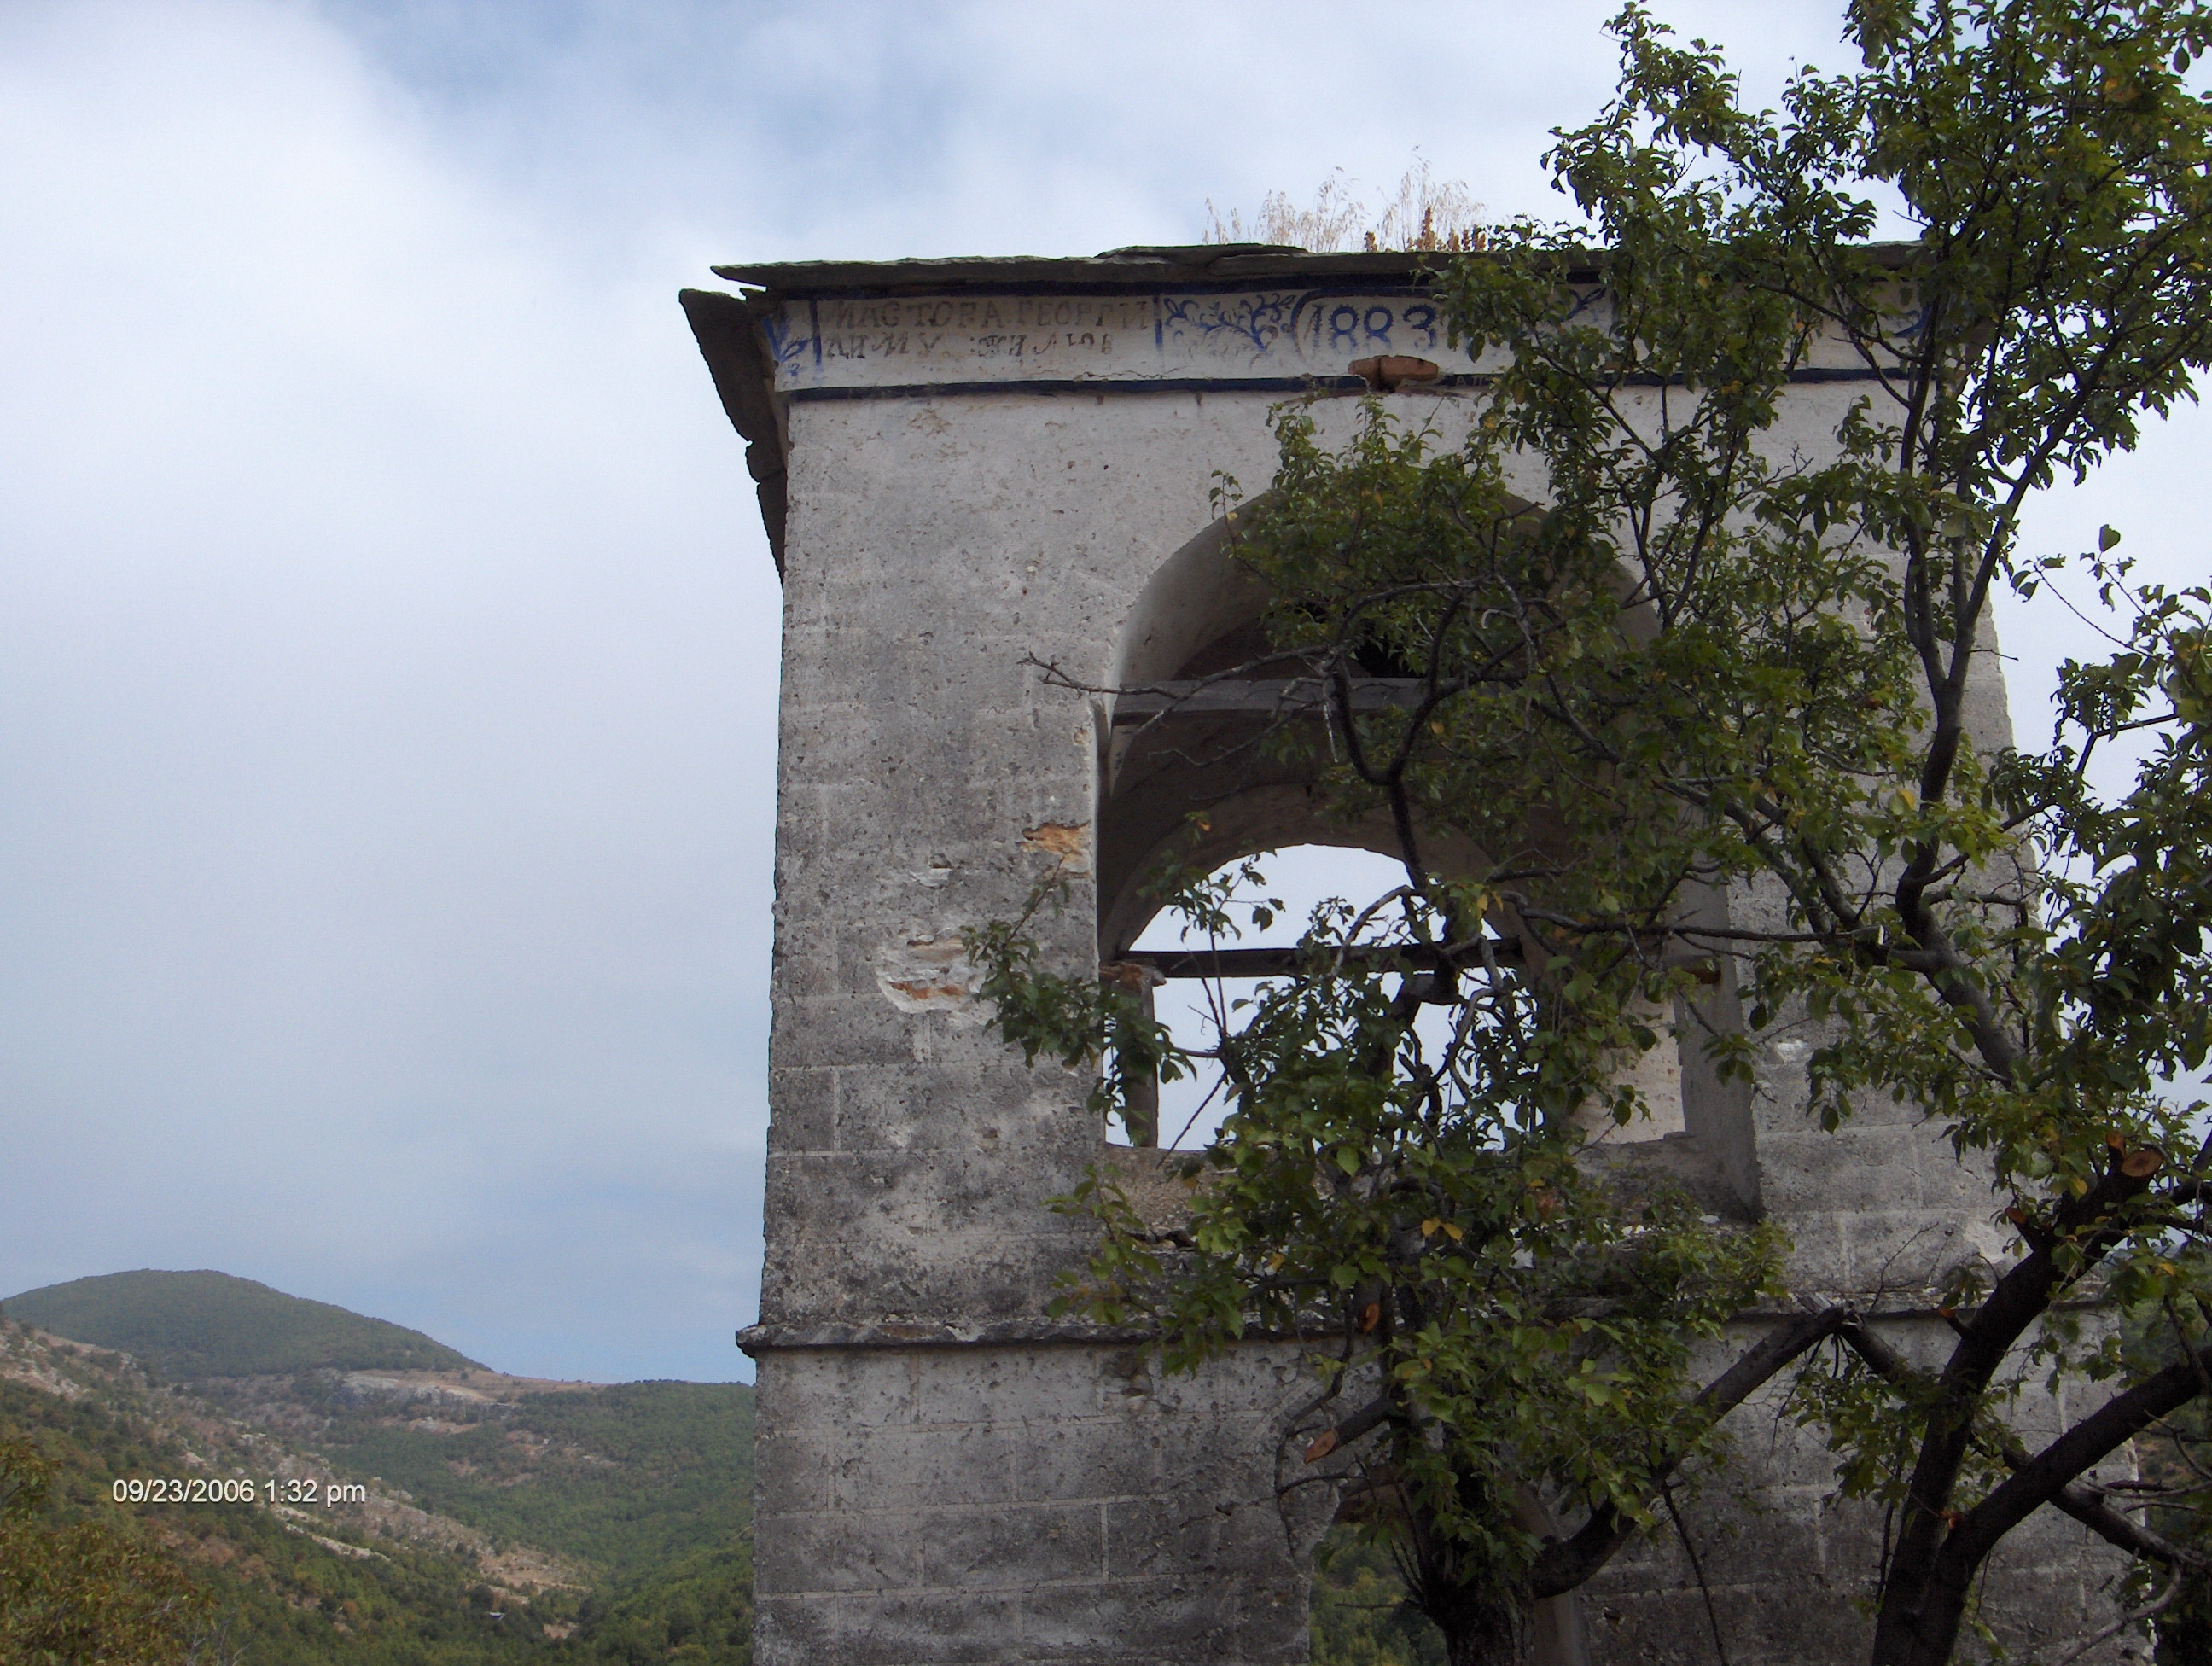 Steeple of bell tower at Banitsa